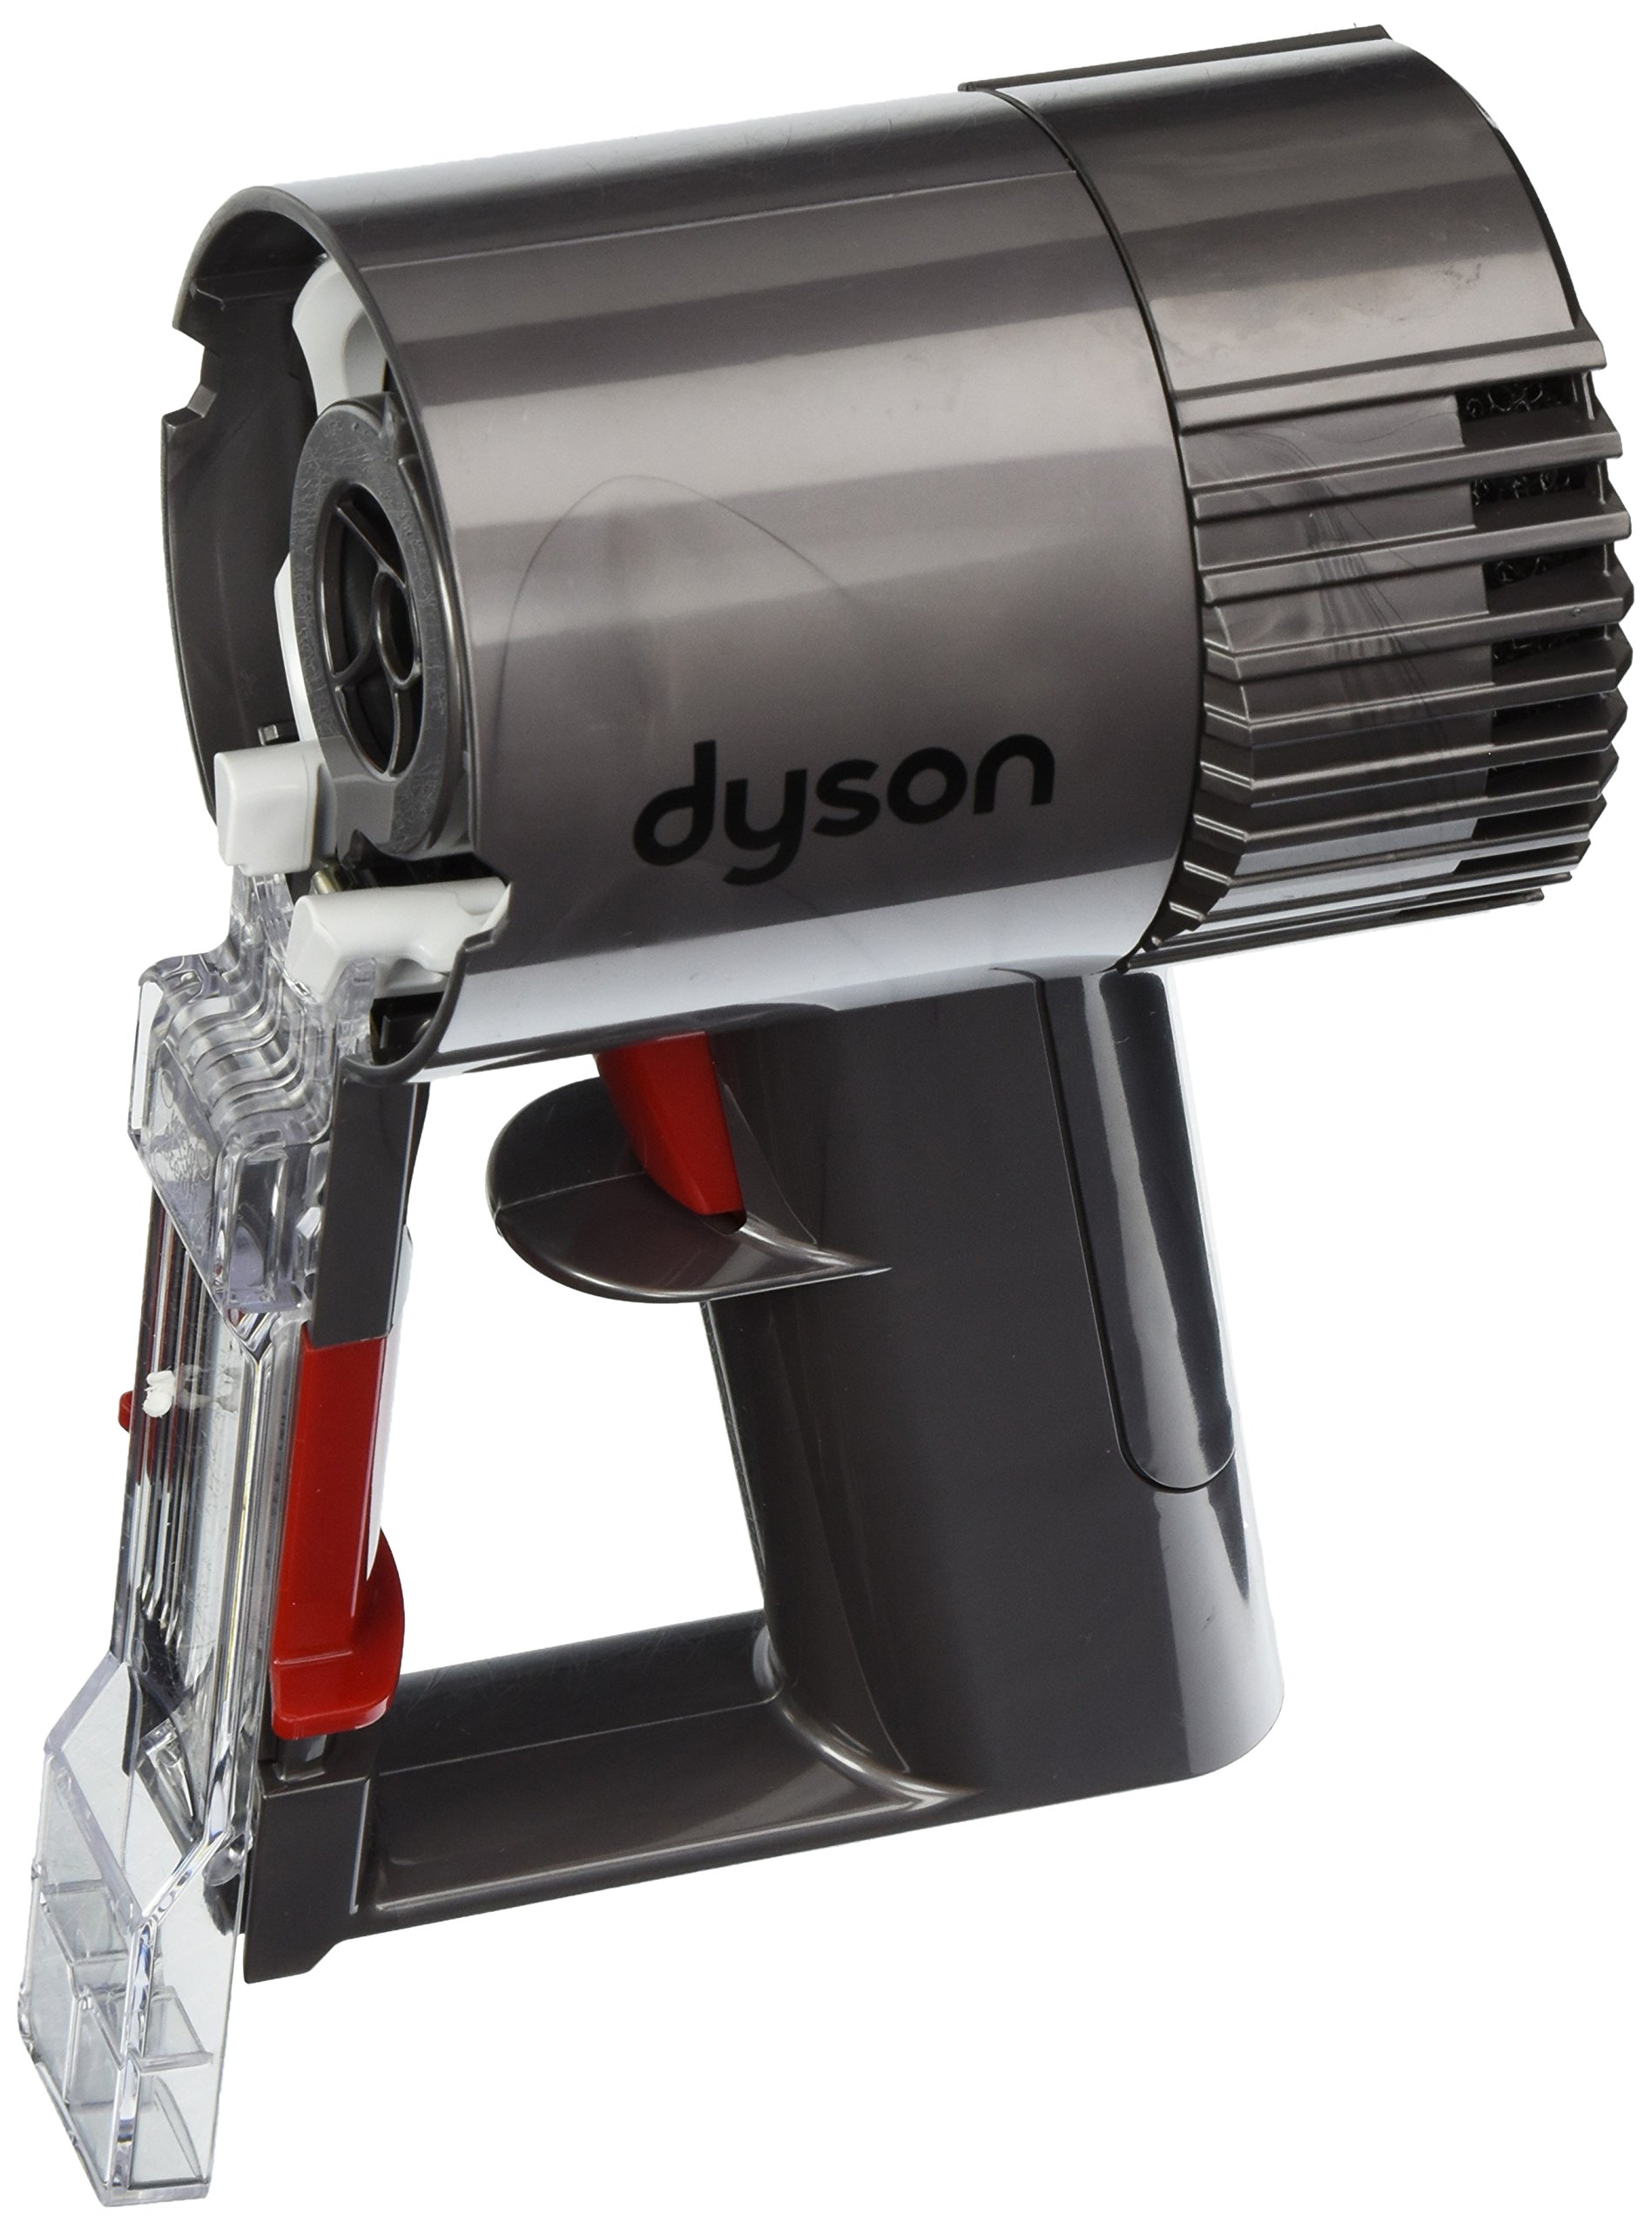 Dyson Main Body, Dc58/59